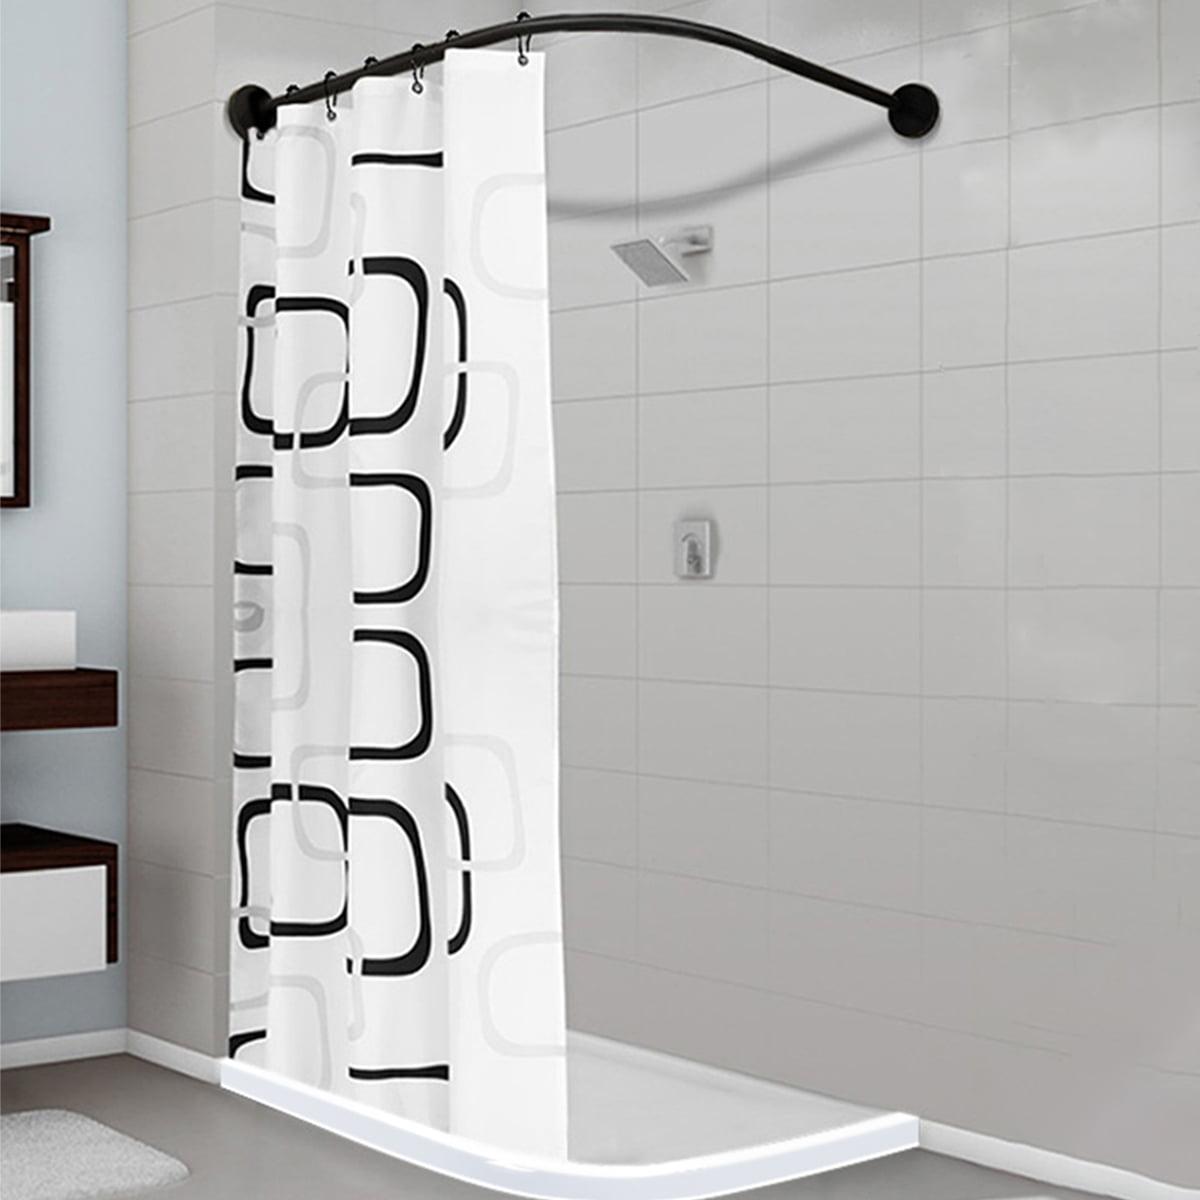 Composite Pipe Shower Curtain Rod Pole